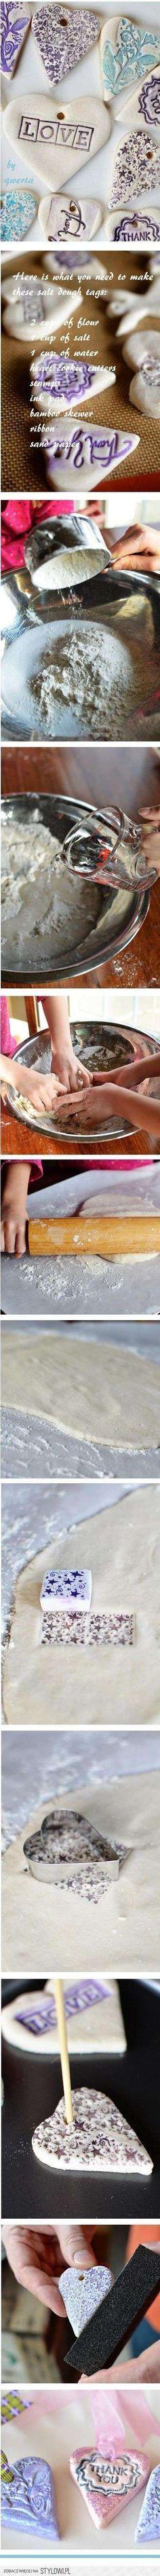 #KatieSheaDesign ♡❤ ❥▶ Salt Dough Hearts #DIY #Crafts for a special day.